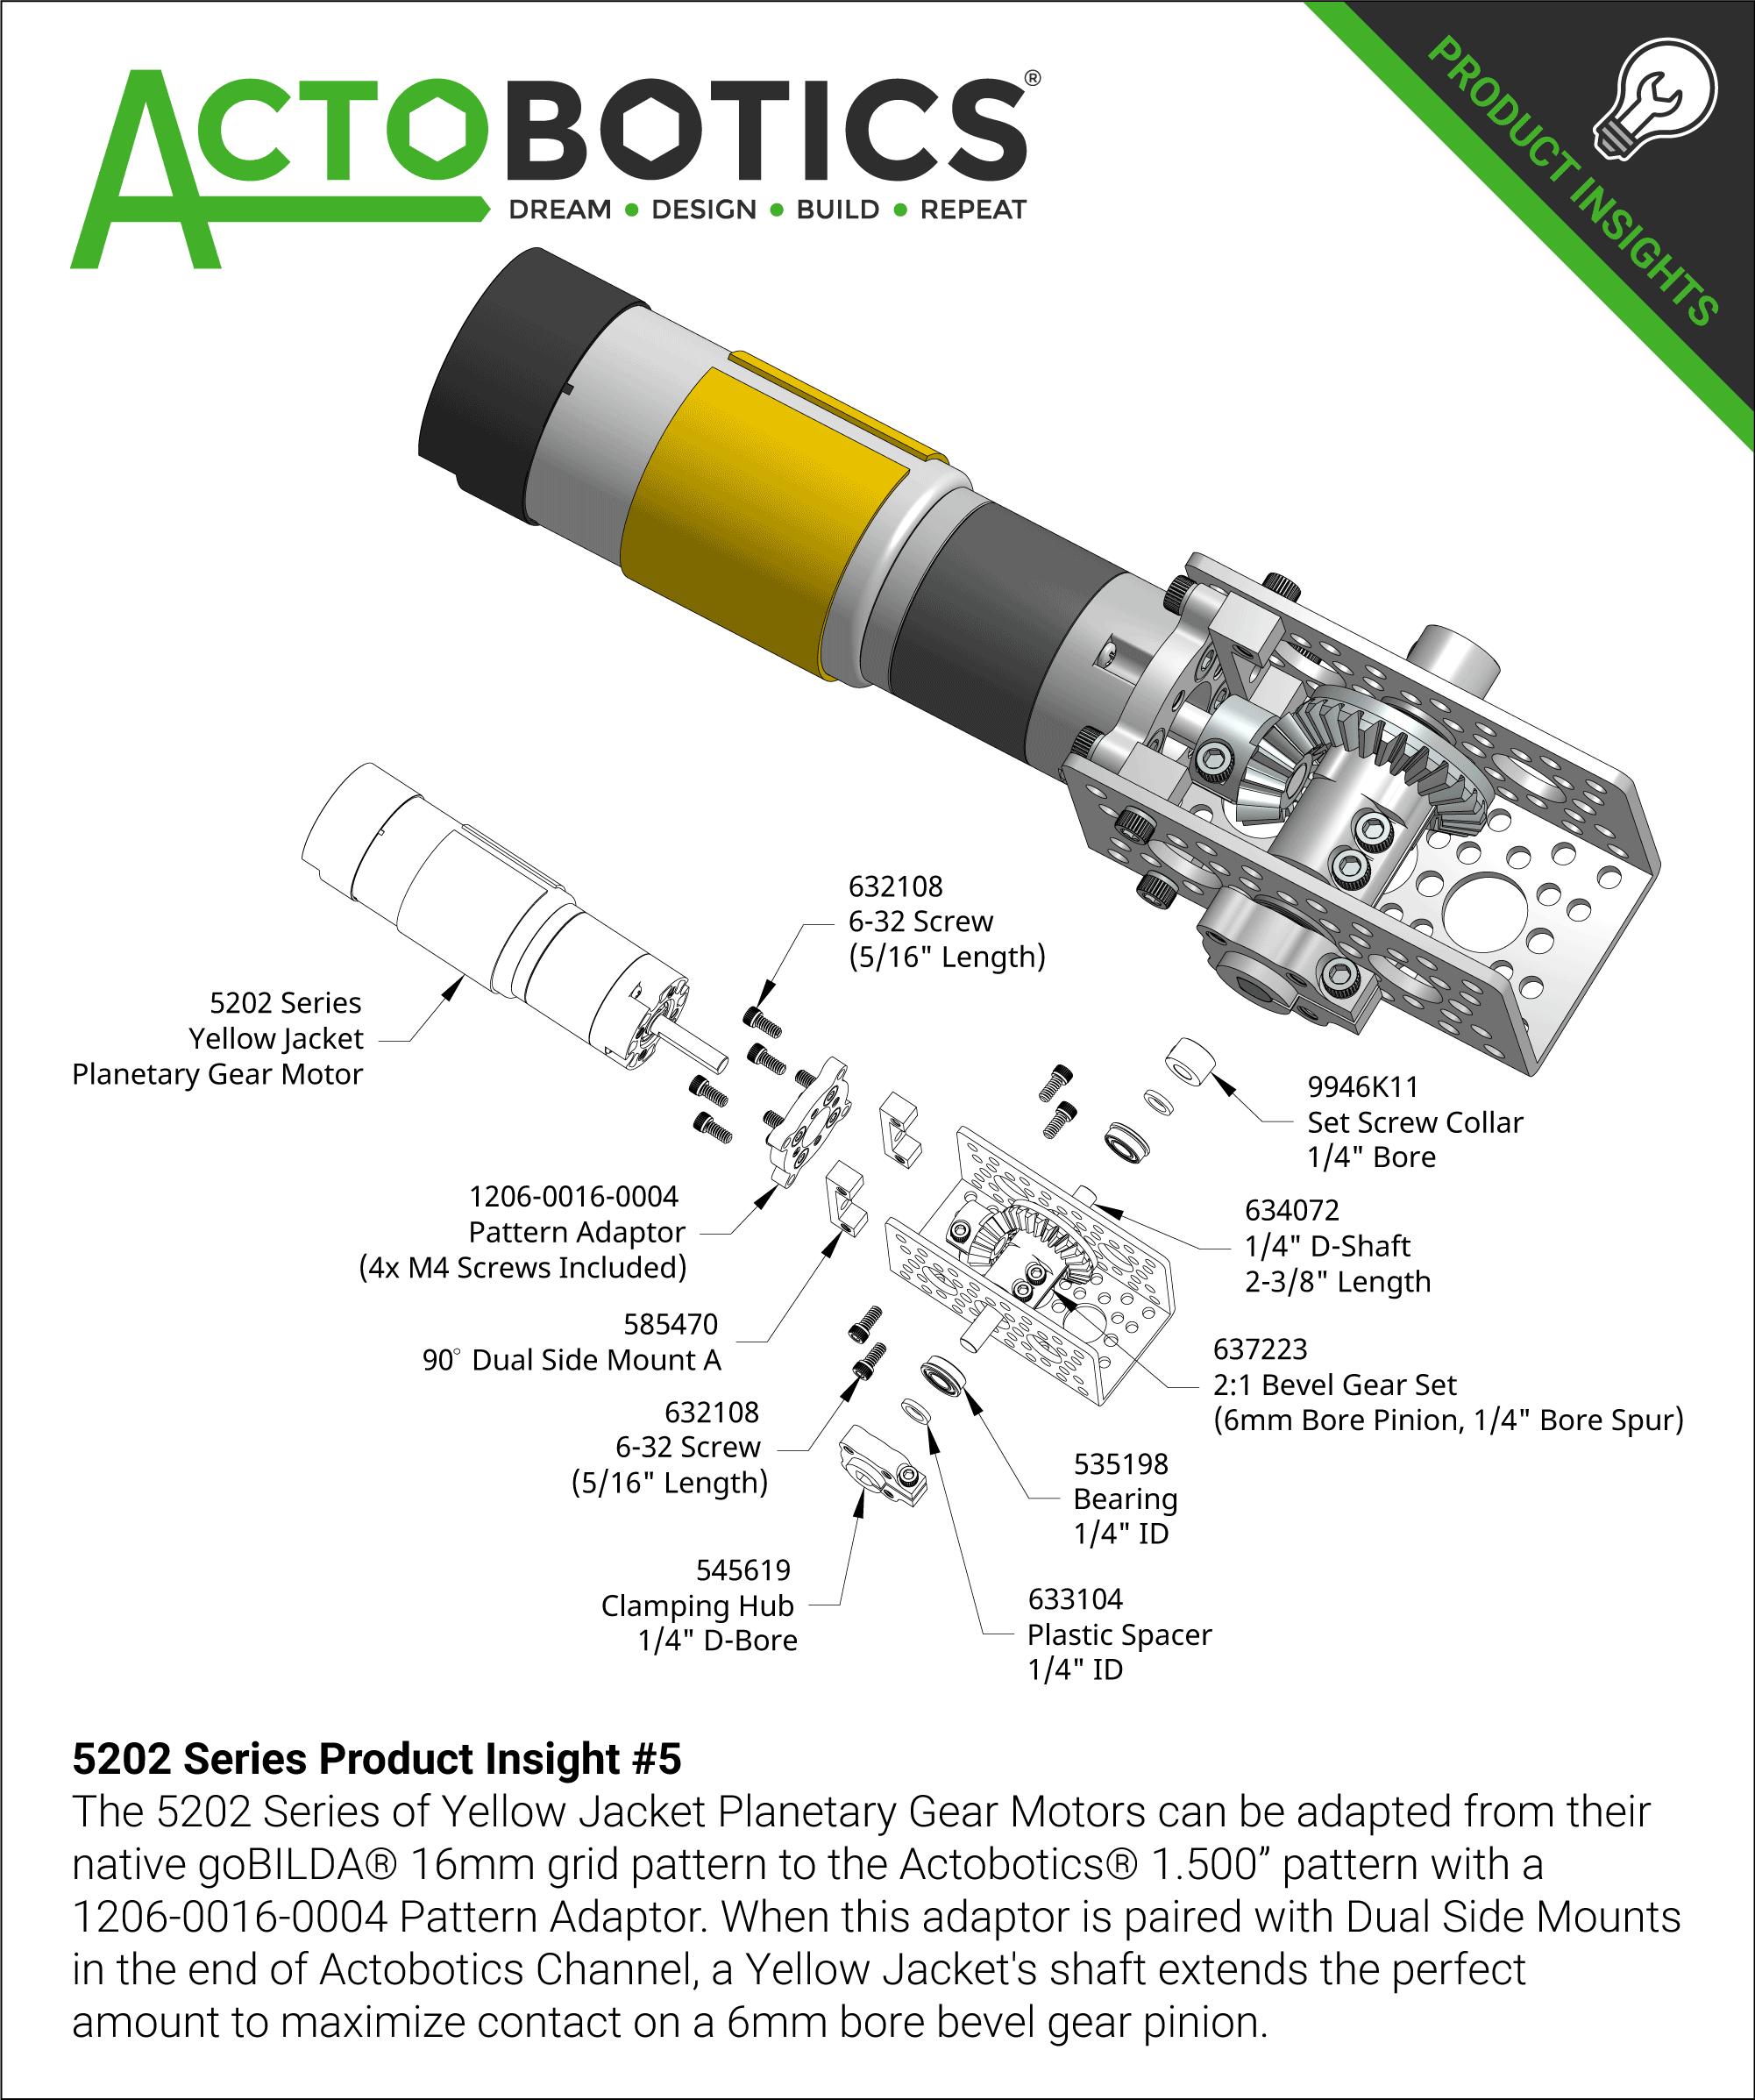 Motodak kit cha/îne d.i.d 520 Type ert2 13//49 Beta Couronne Standard